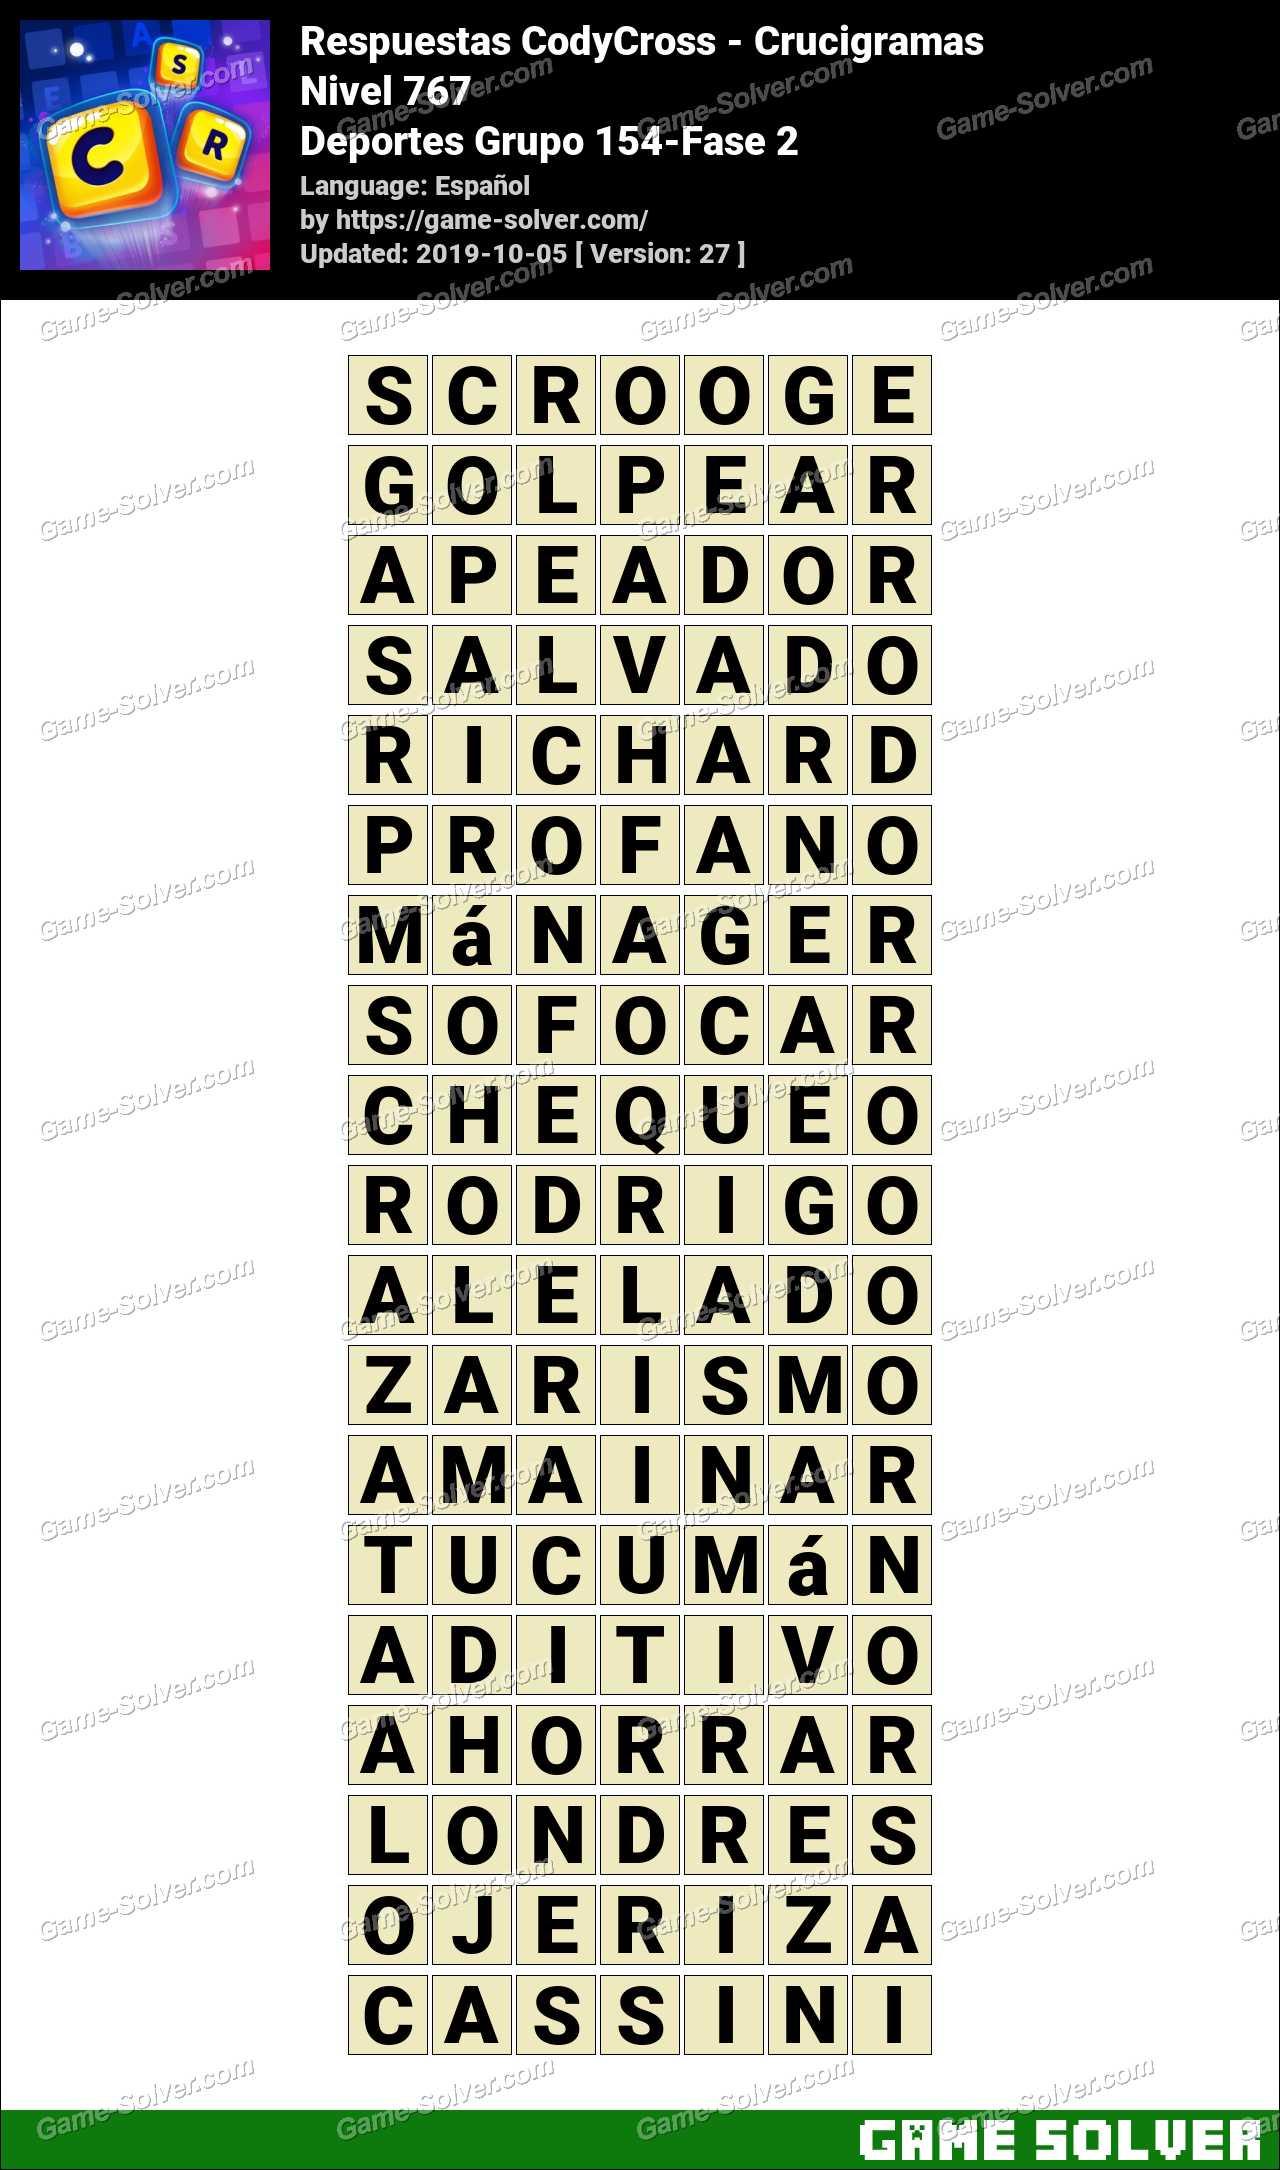 Respuestas CodyCross Deportes Grupo 154-Fase 2